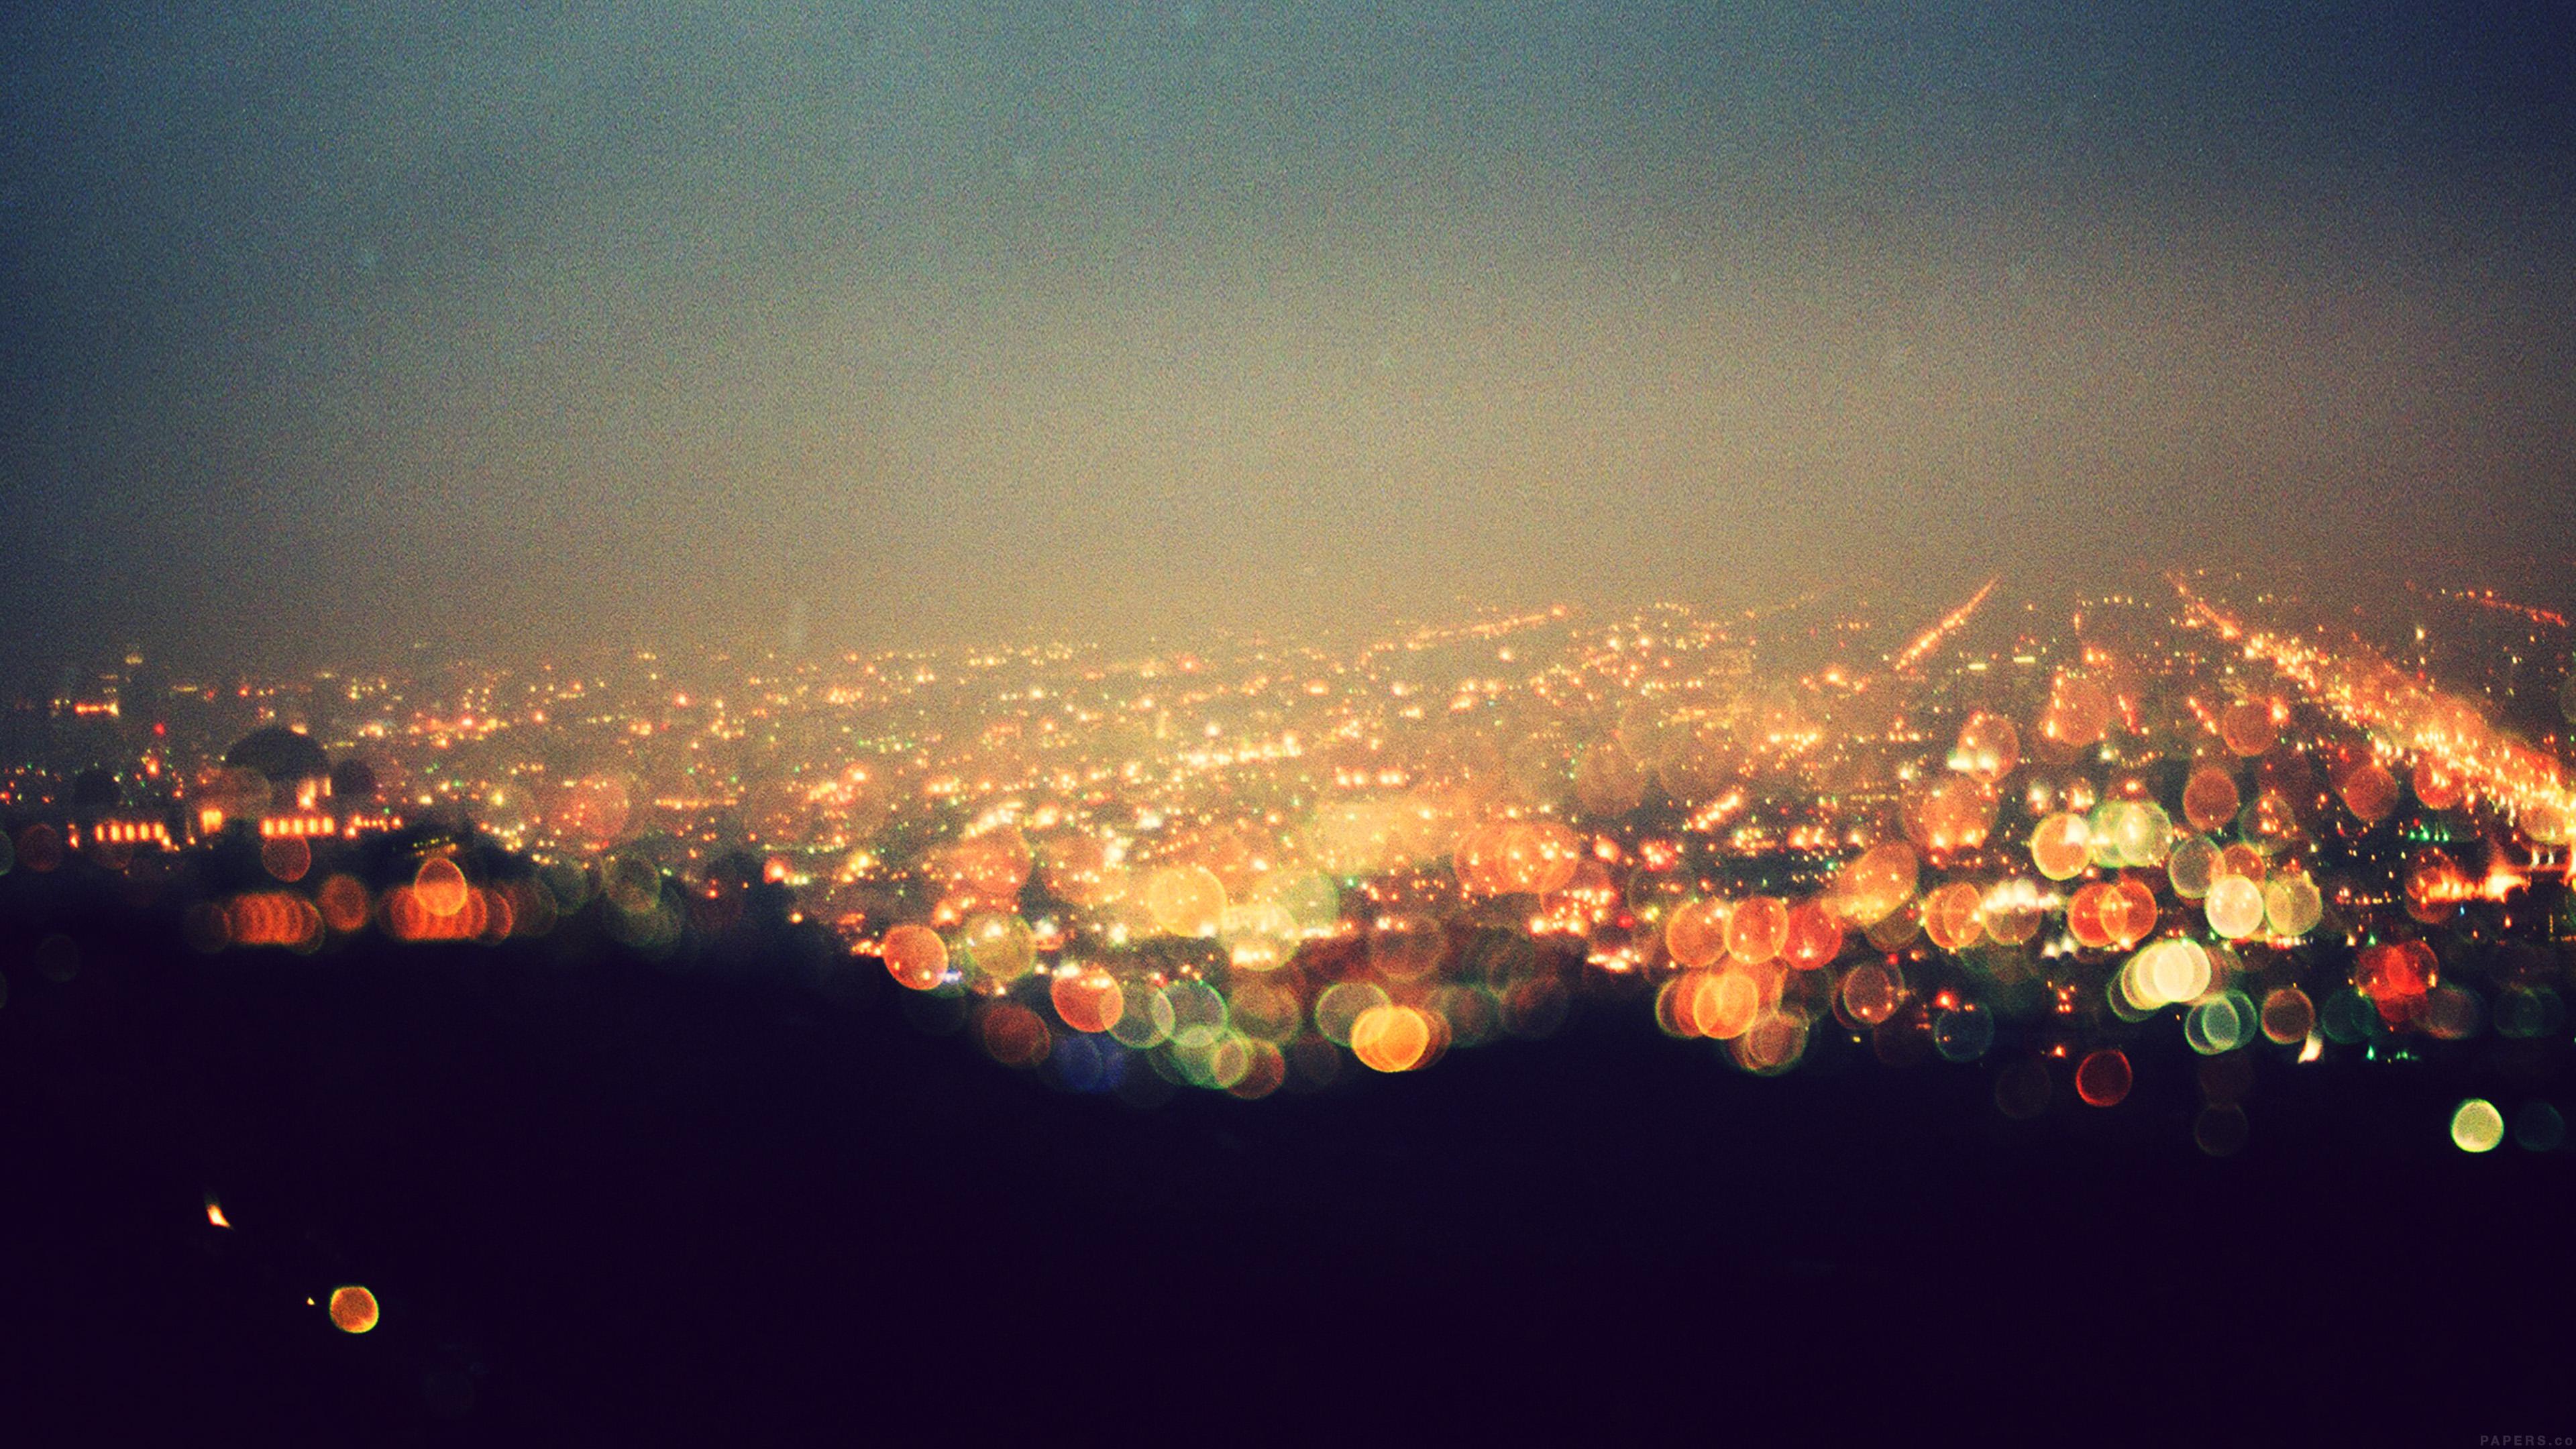 Wallpaper for desktop laptop mq71 bokeh night city view - Night light city wallpaper ...